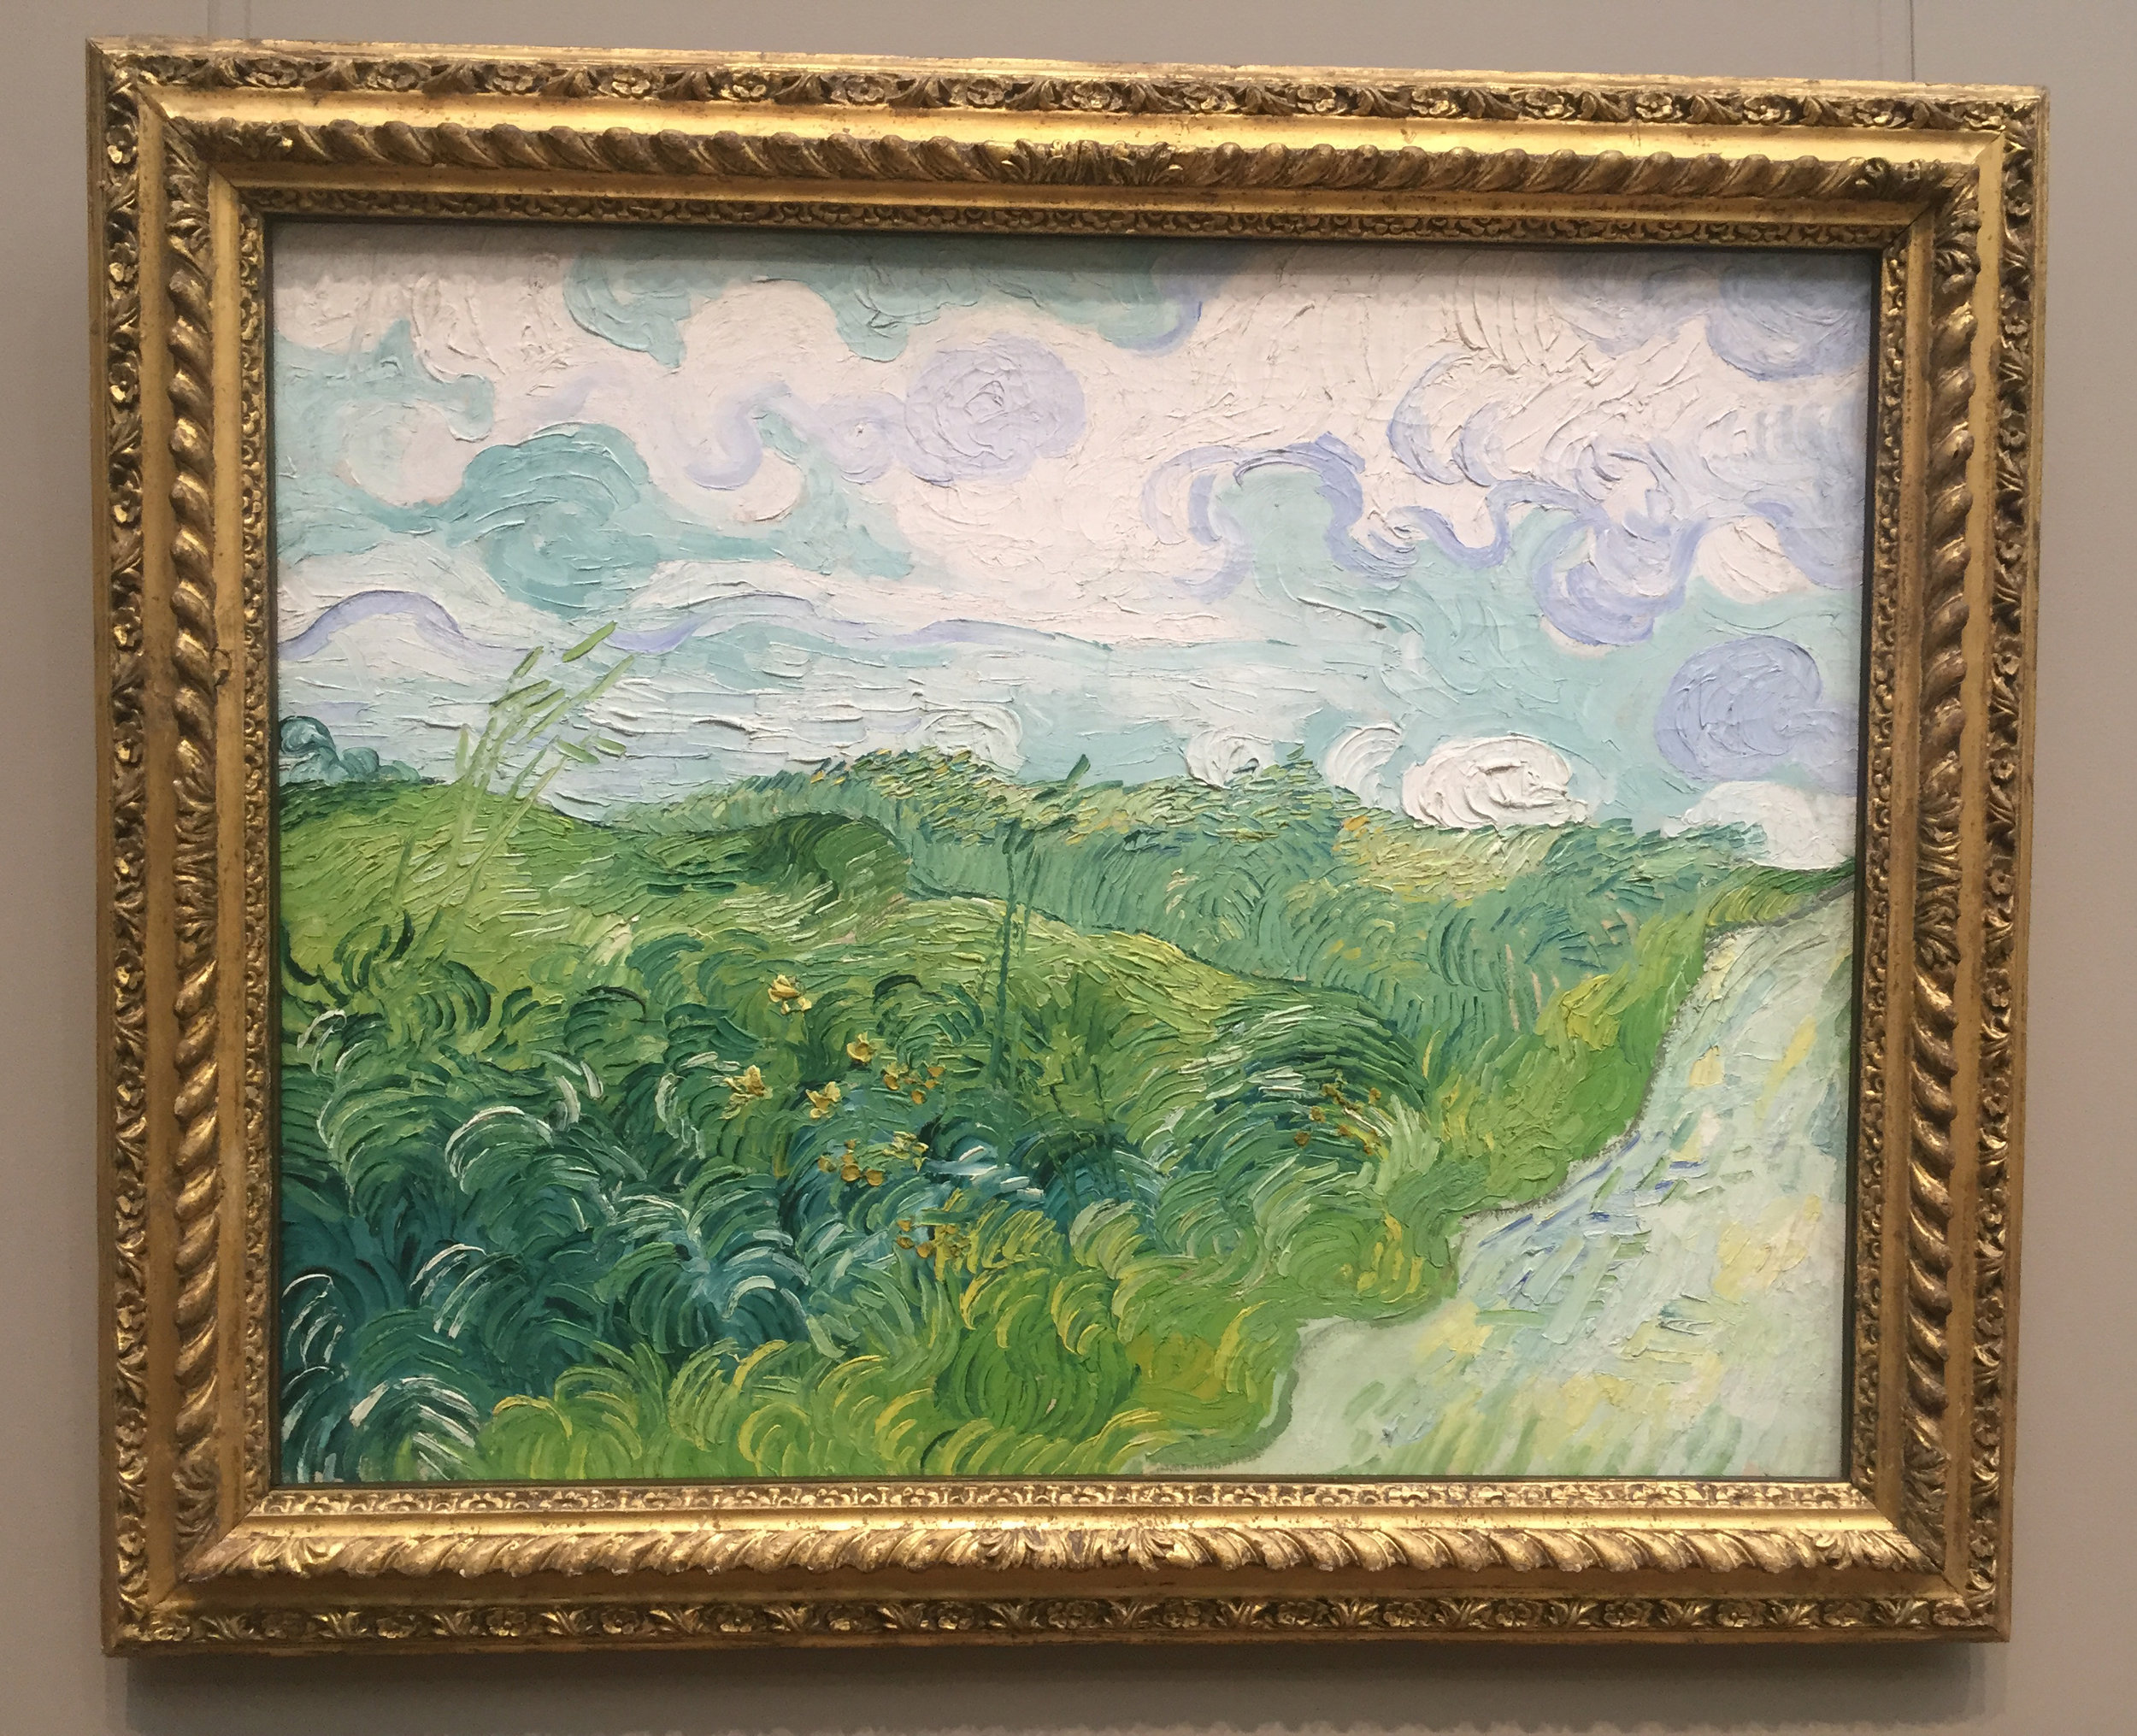 van gogh wheat fields grass national gallery.jpg